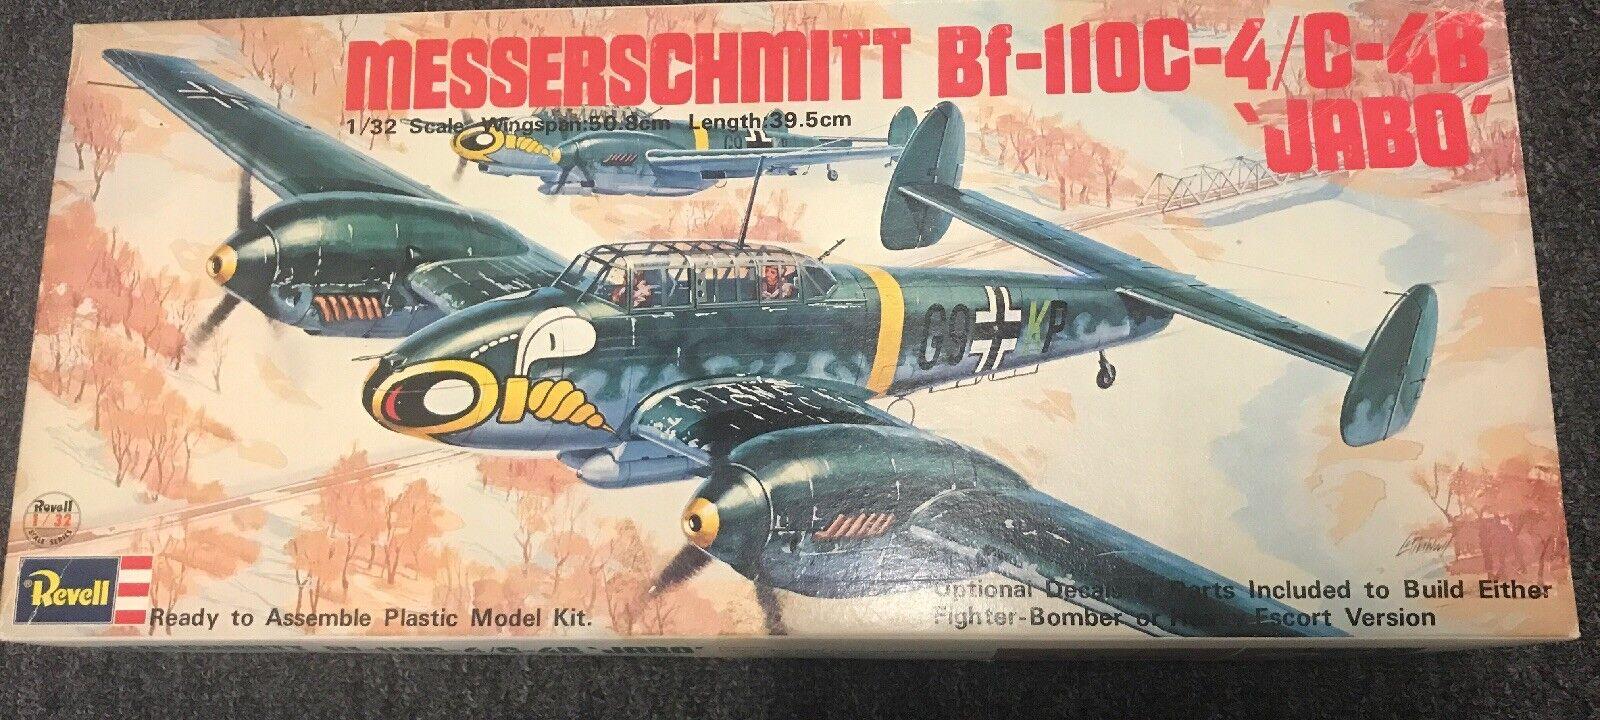 1 32 Revell H-249 Messerschmidtt BF110C-4 C-4B Jabo.